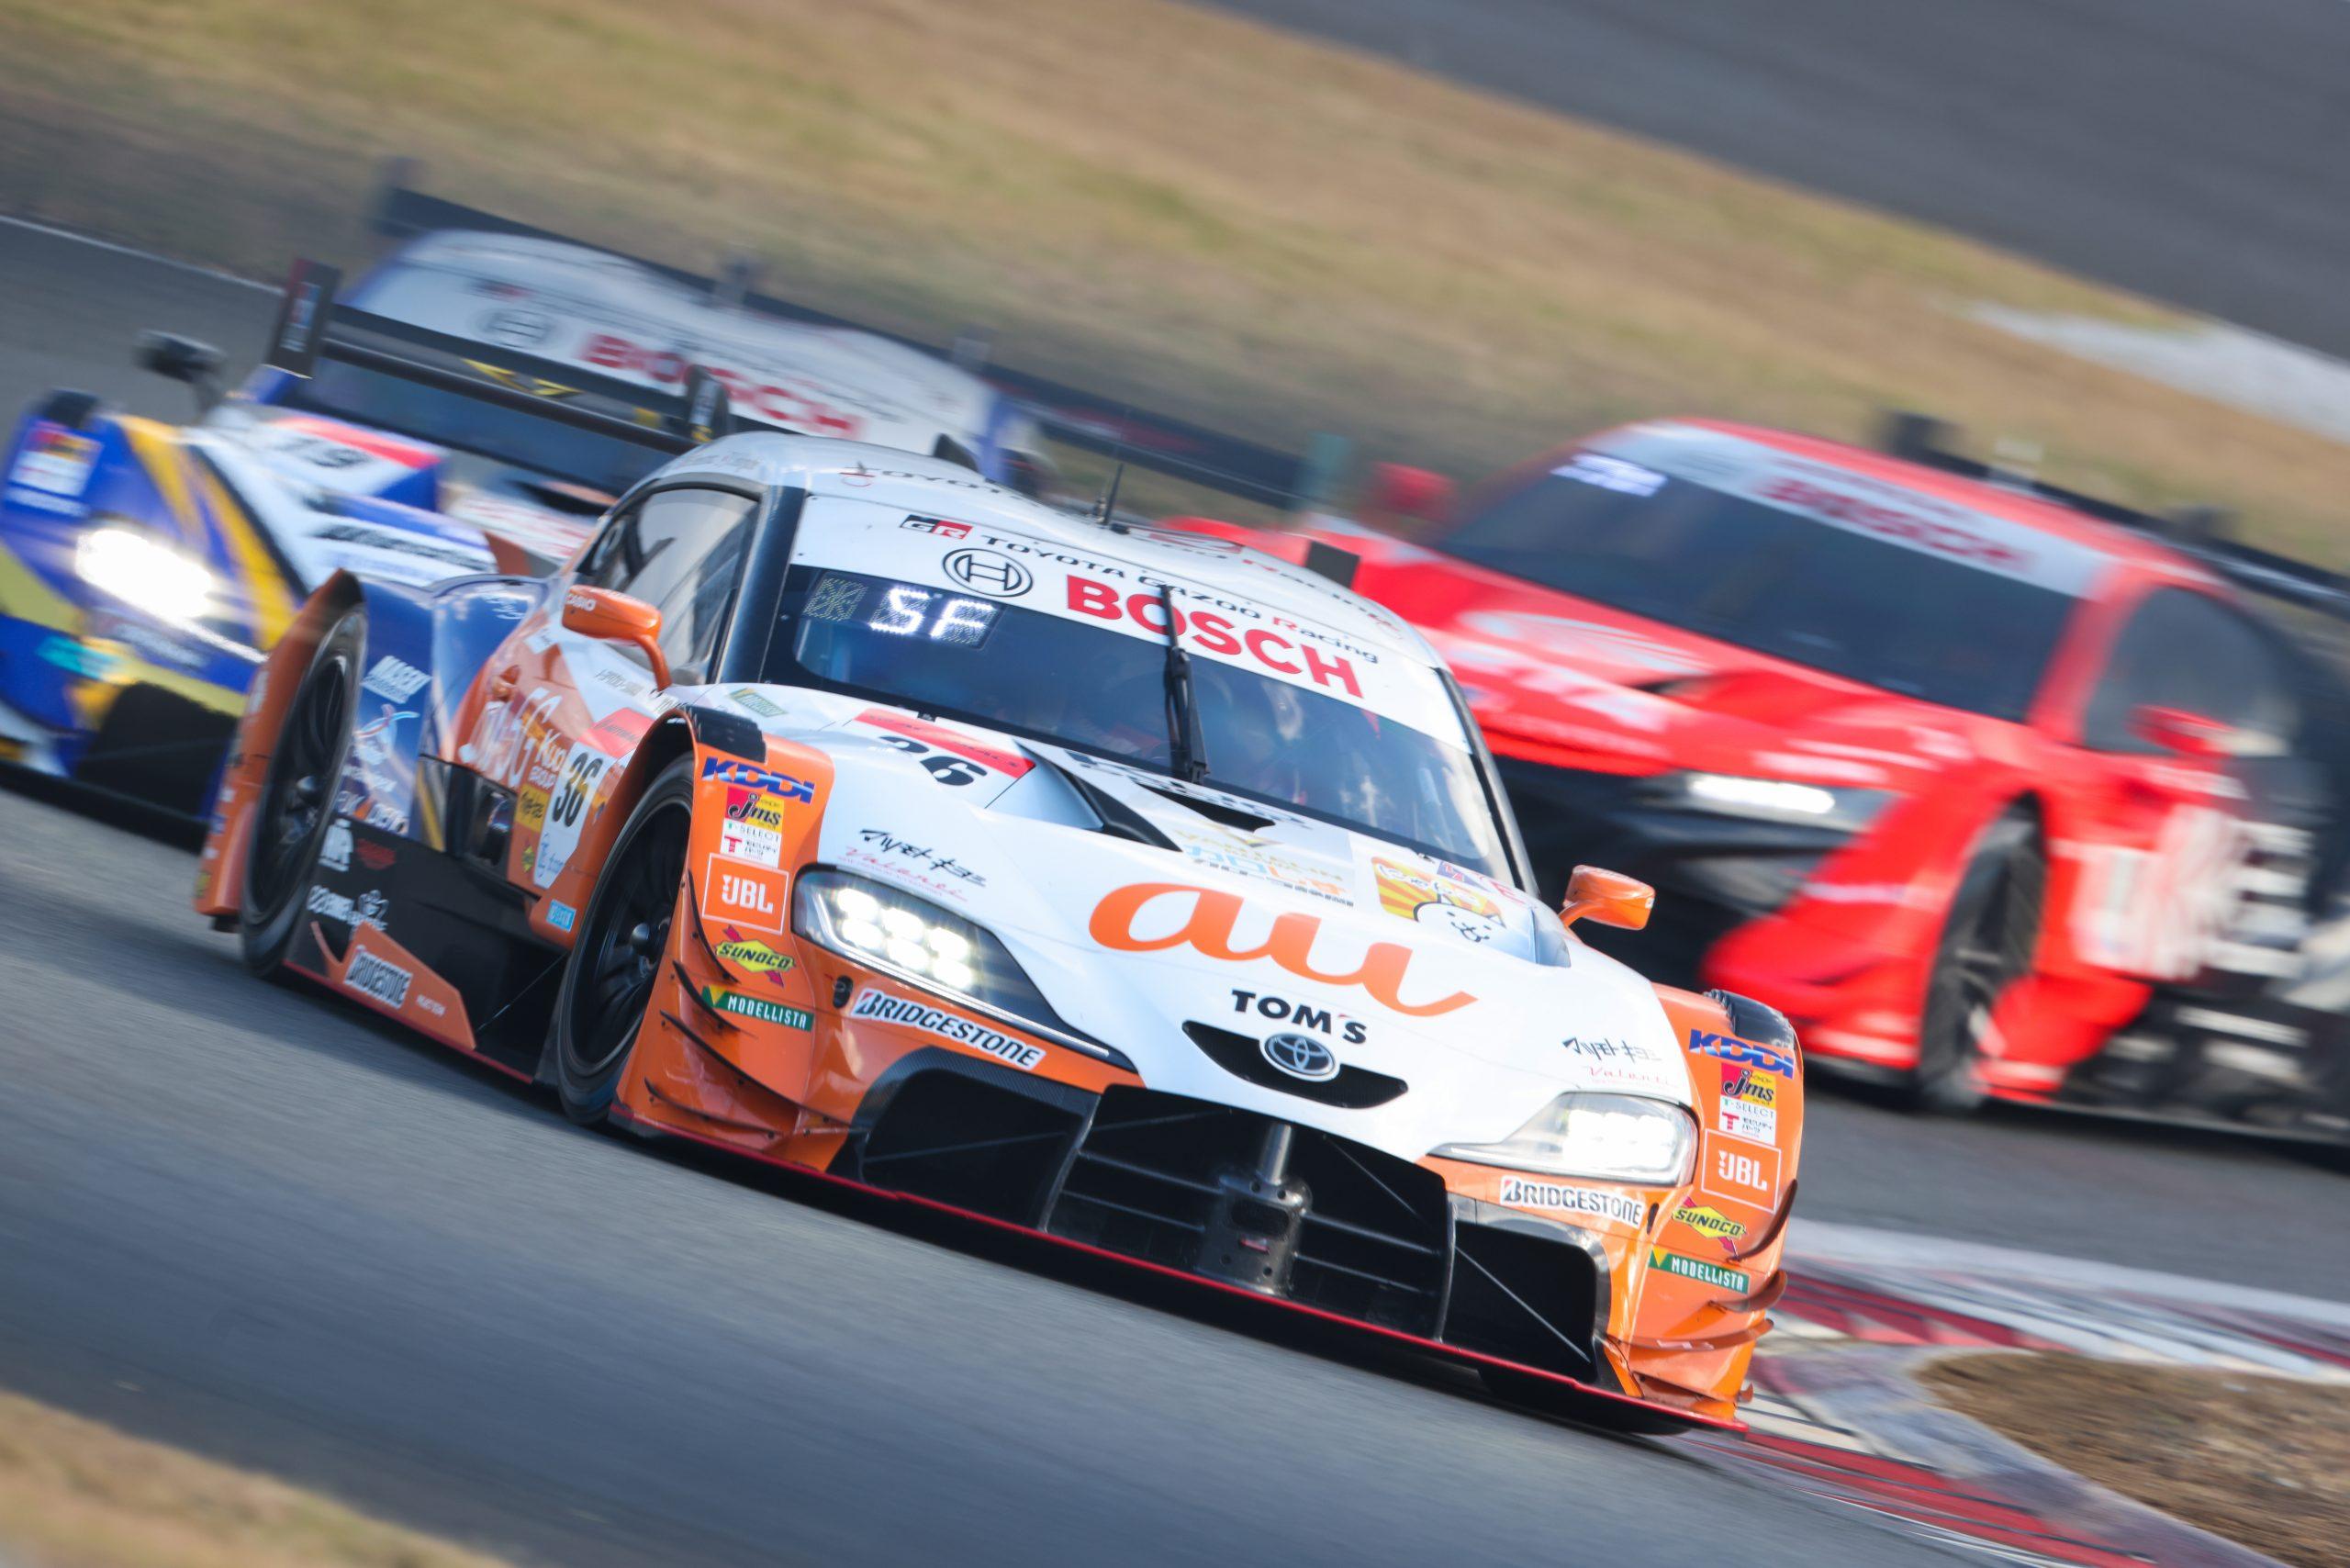 Motorsports photo #12 【EOS R5】